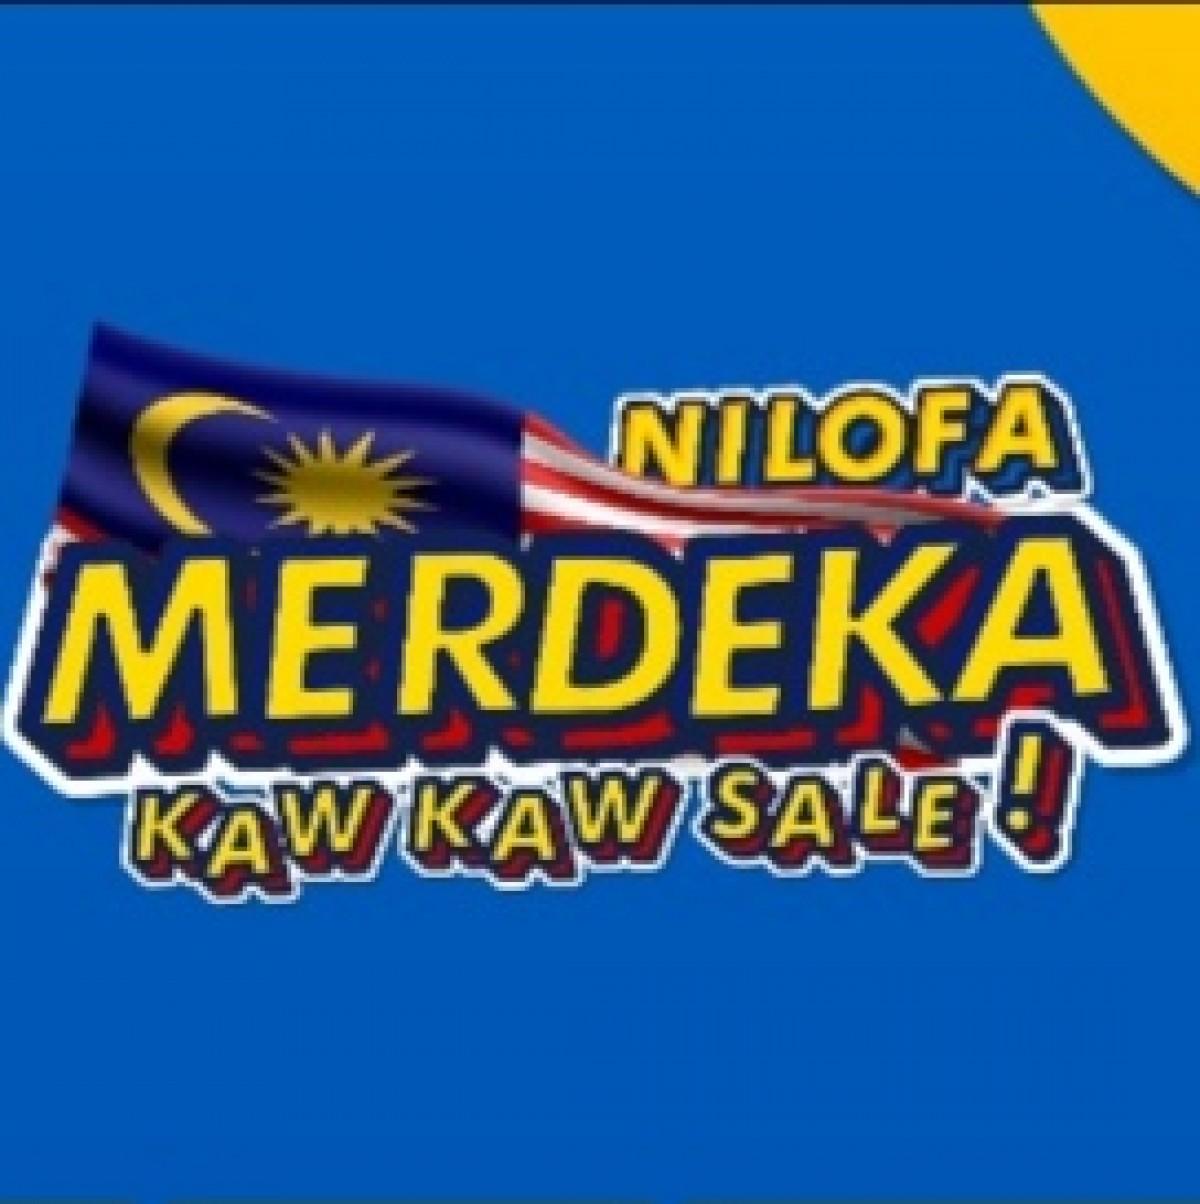 Nilofa Merdeka Kaw Kaw Sale (1 Carton) - MARKAZ TIJAARI